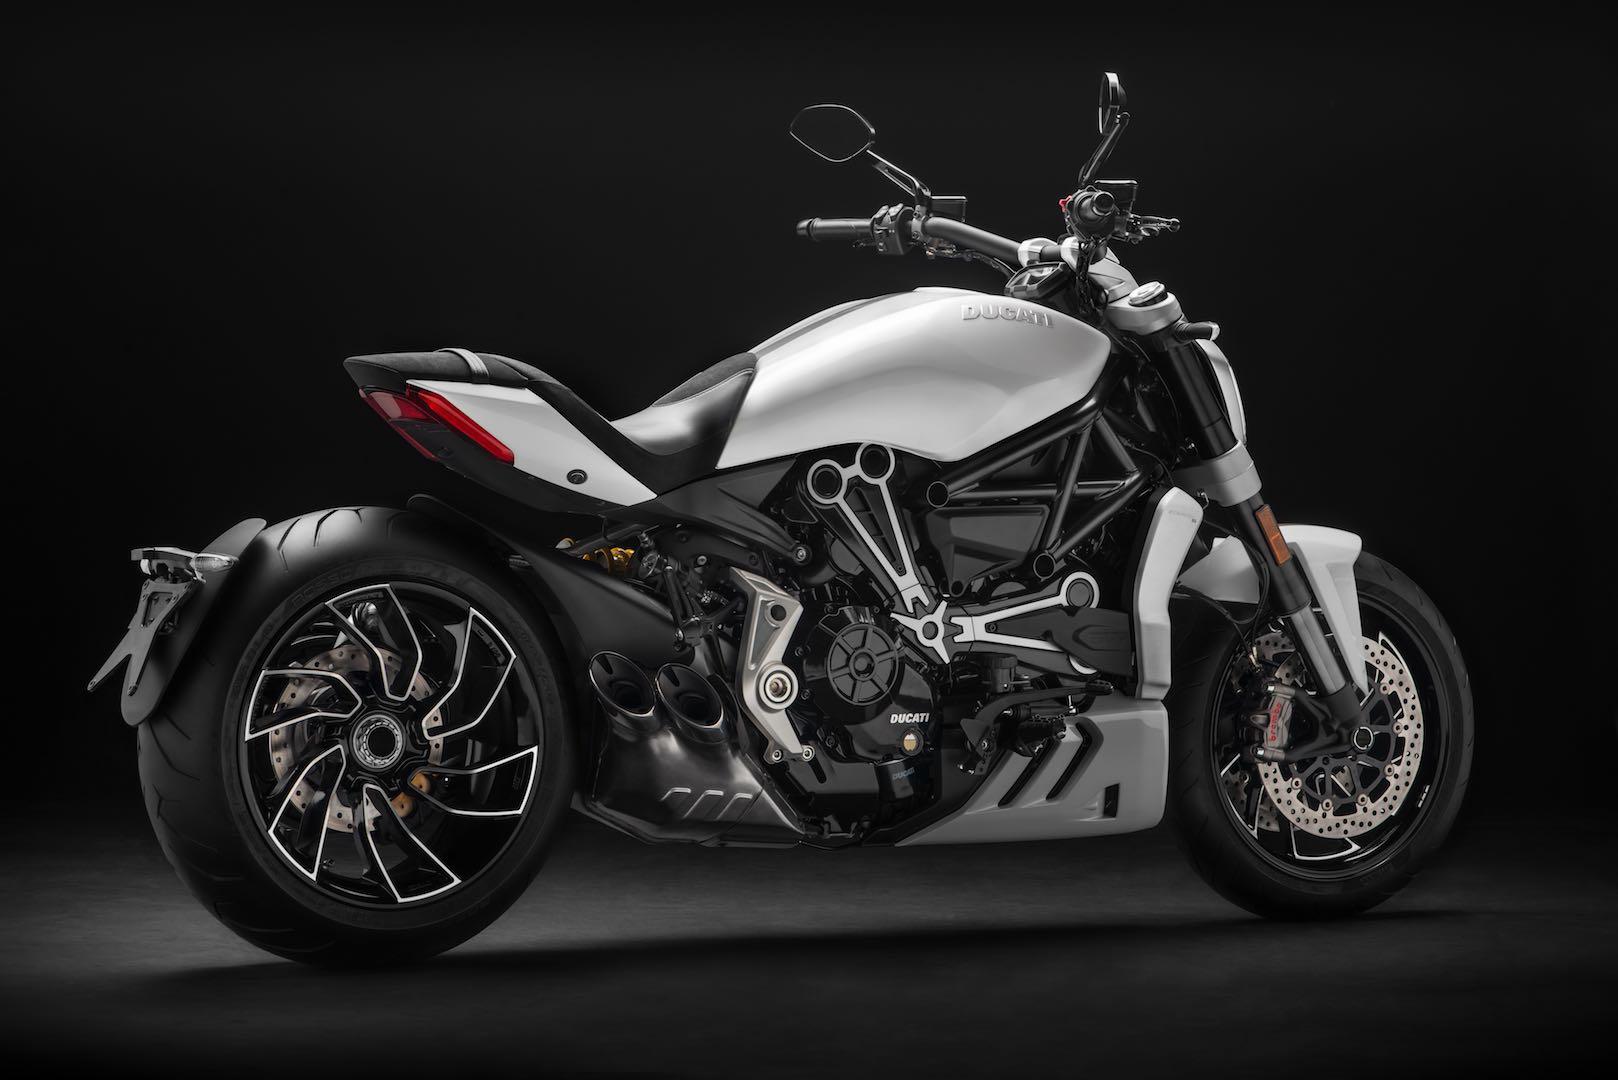 Ducati to debut 2018 range in Long Beach IMS